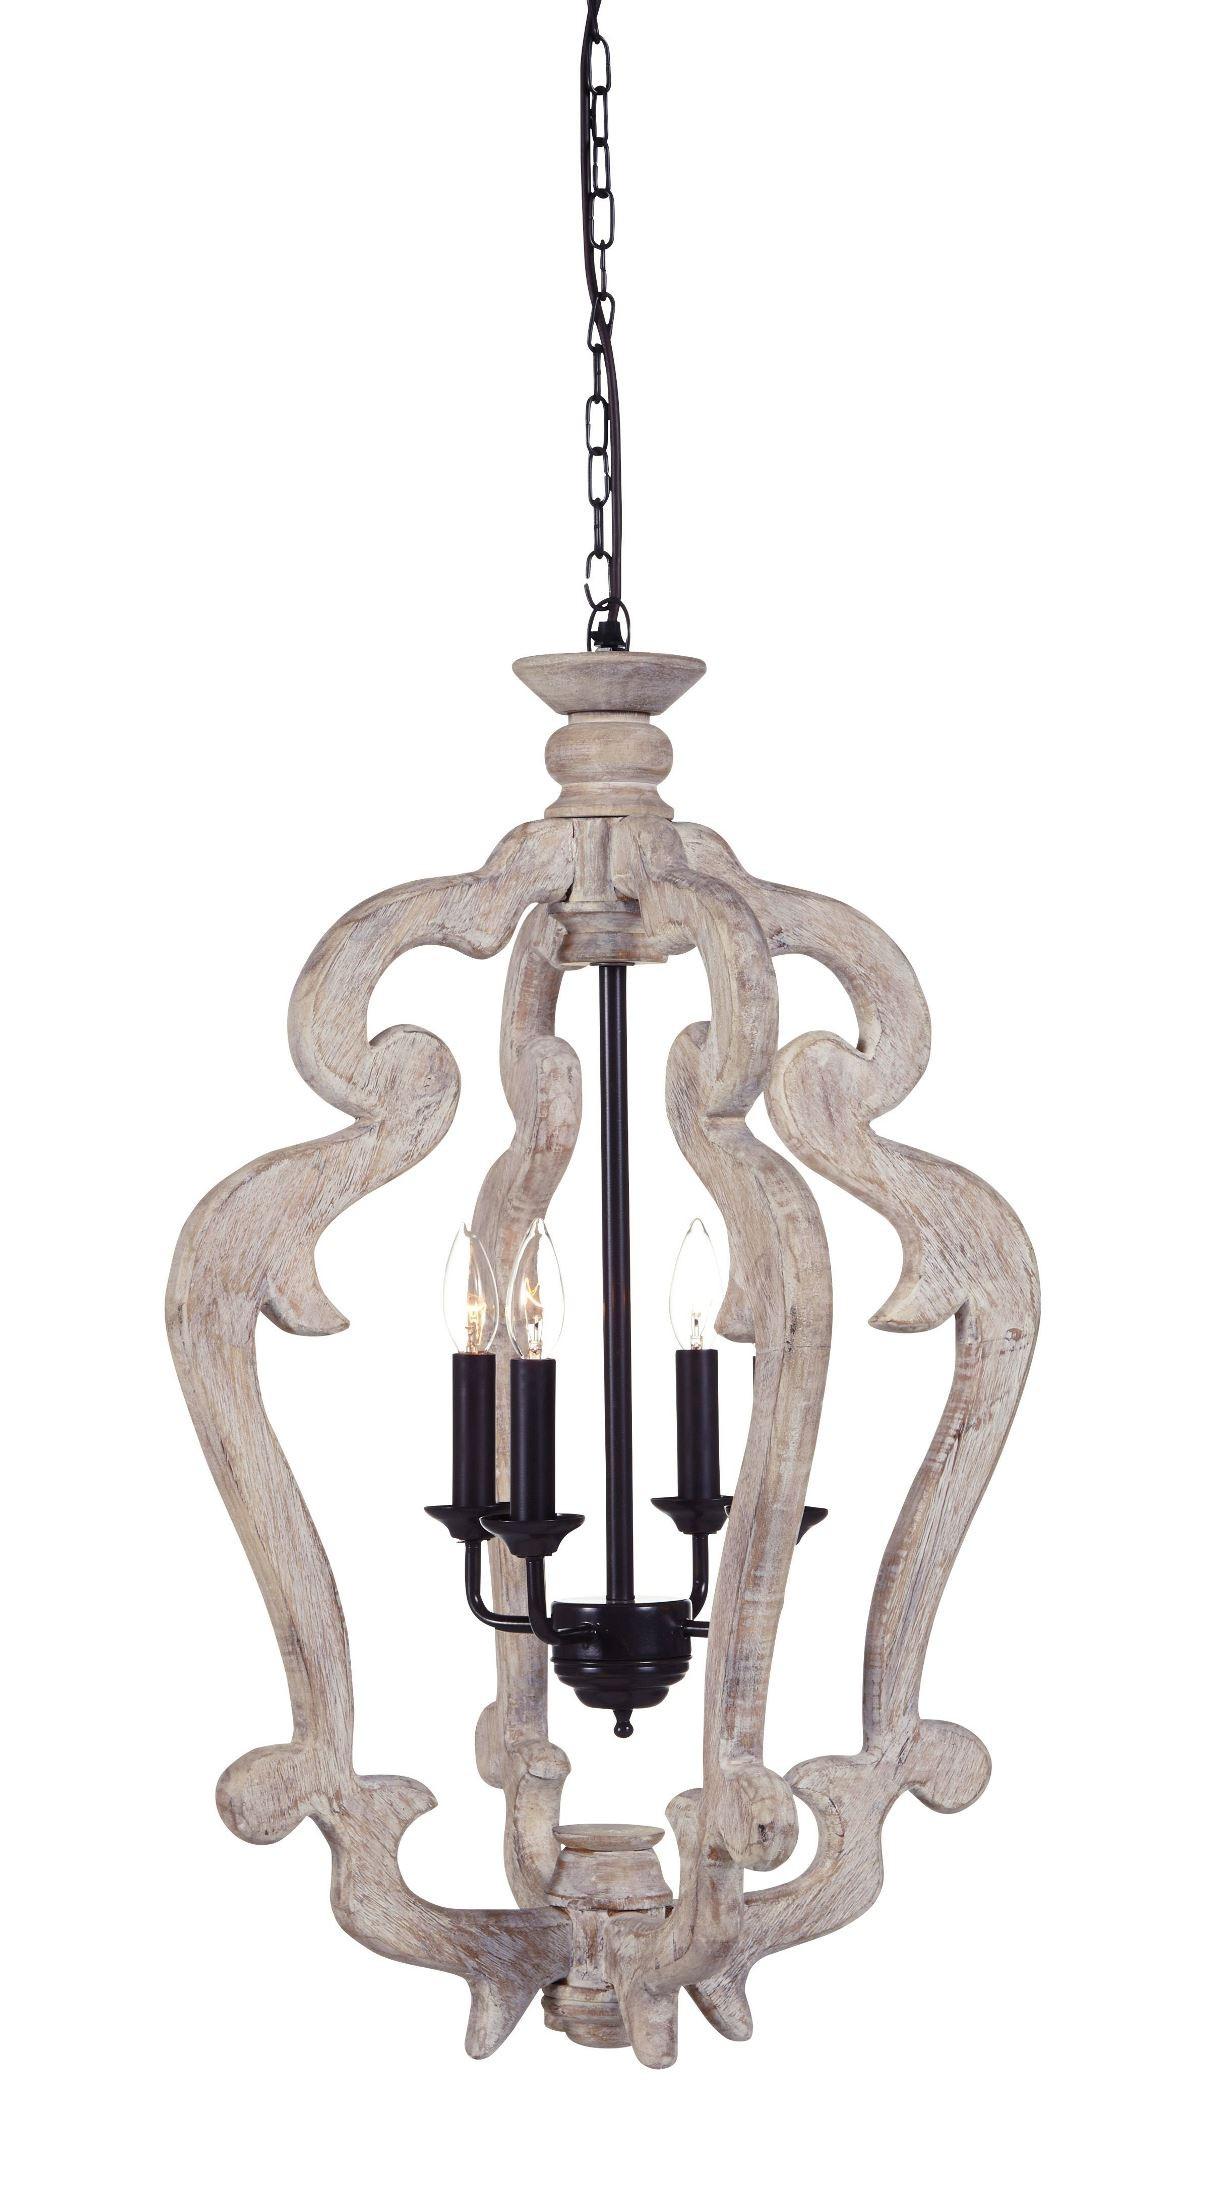 Jocelin Distressed White Wood Pendant Light L000548 Ashley